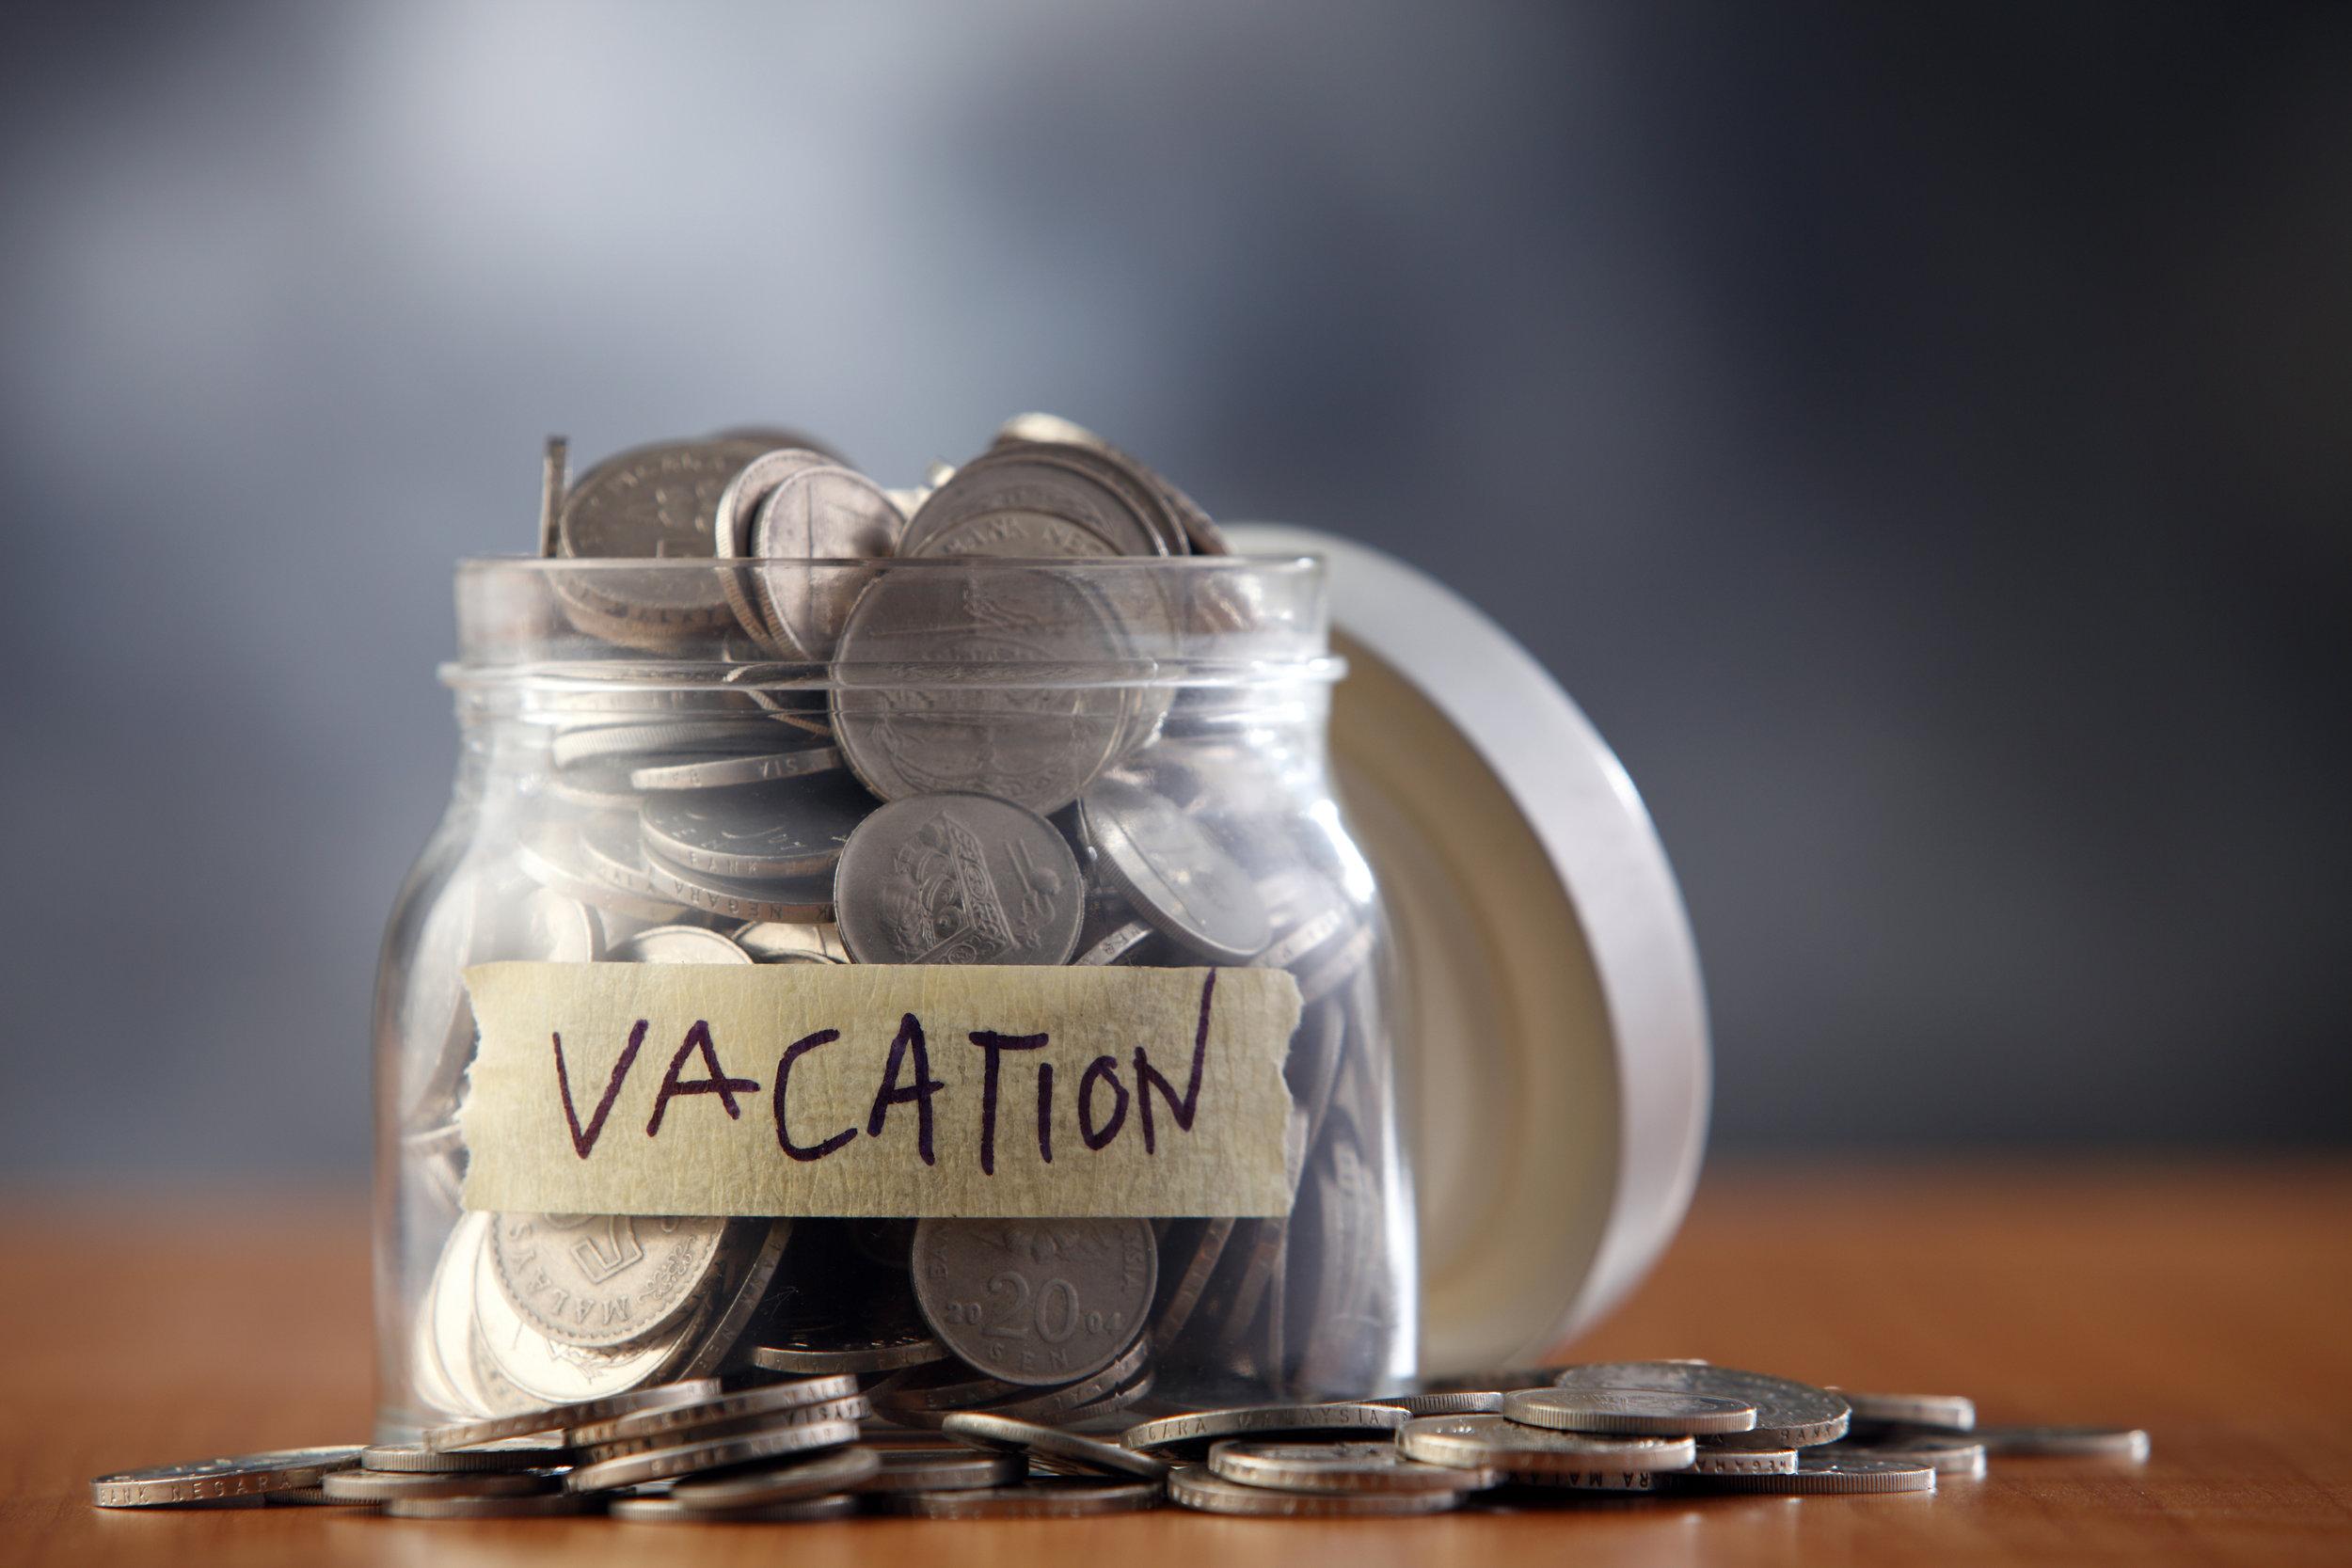 Vacation-Money.jpg